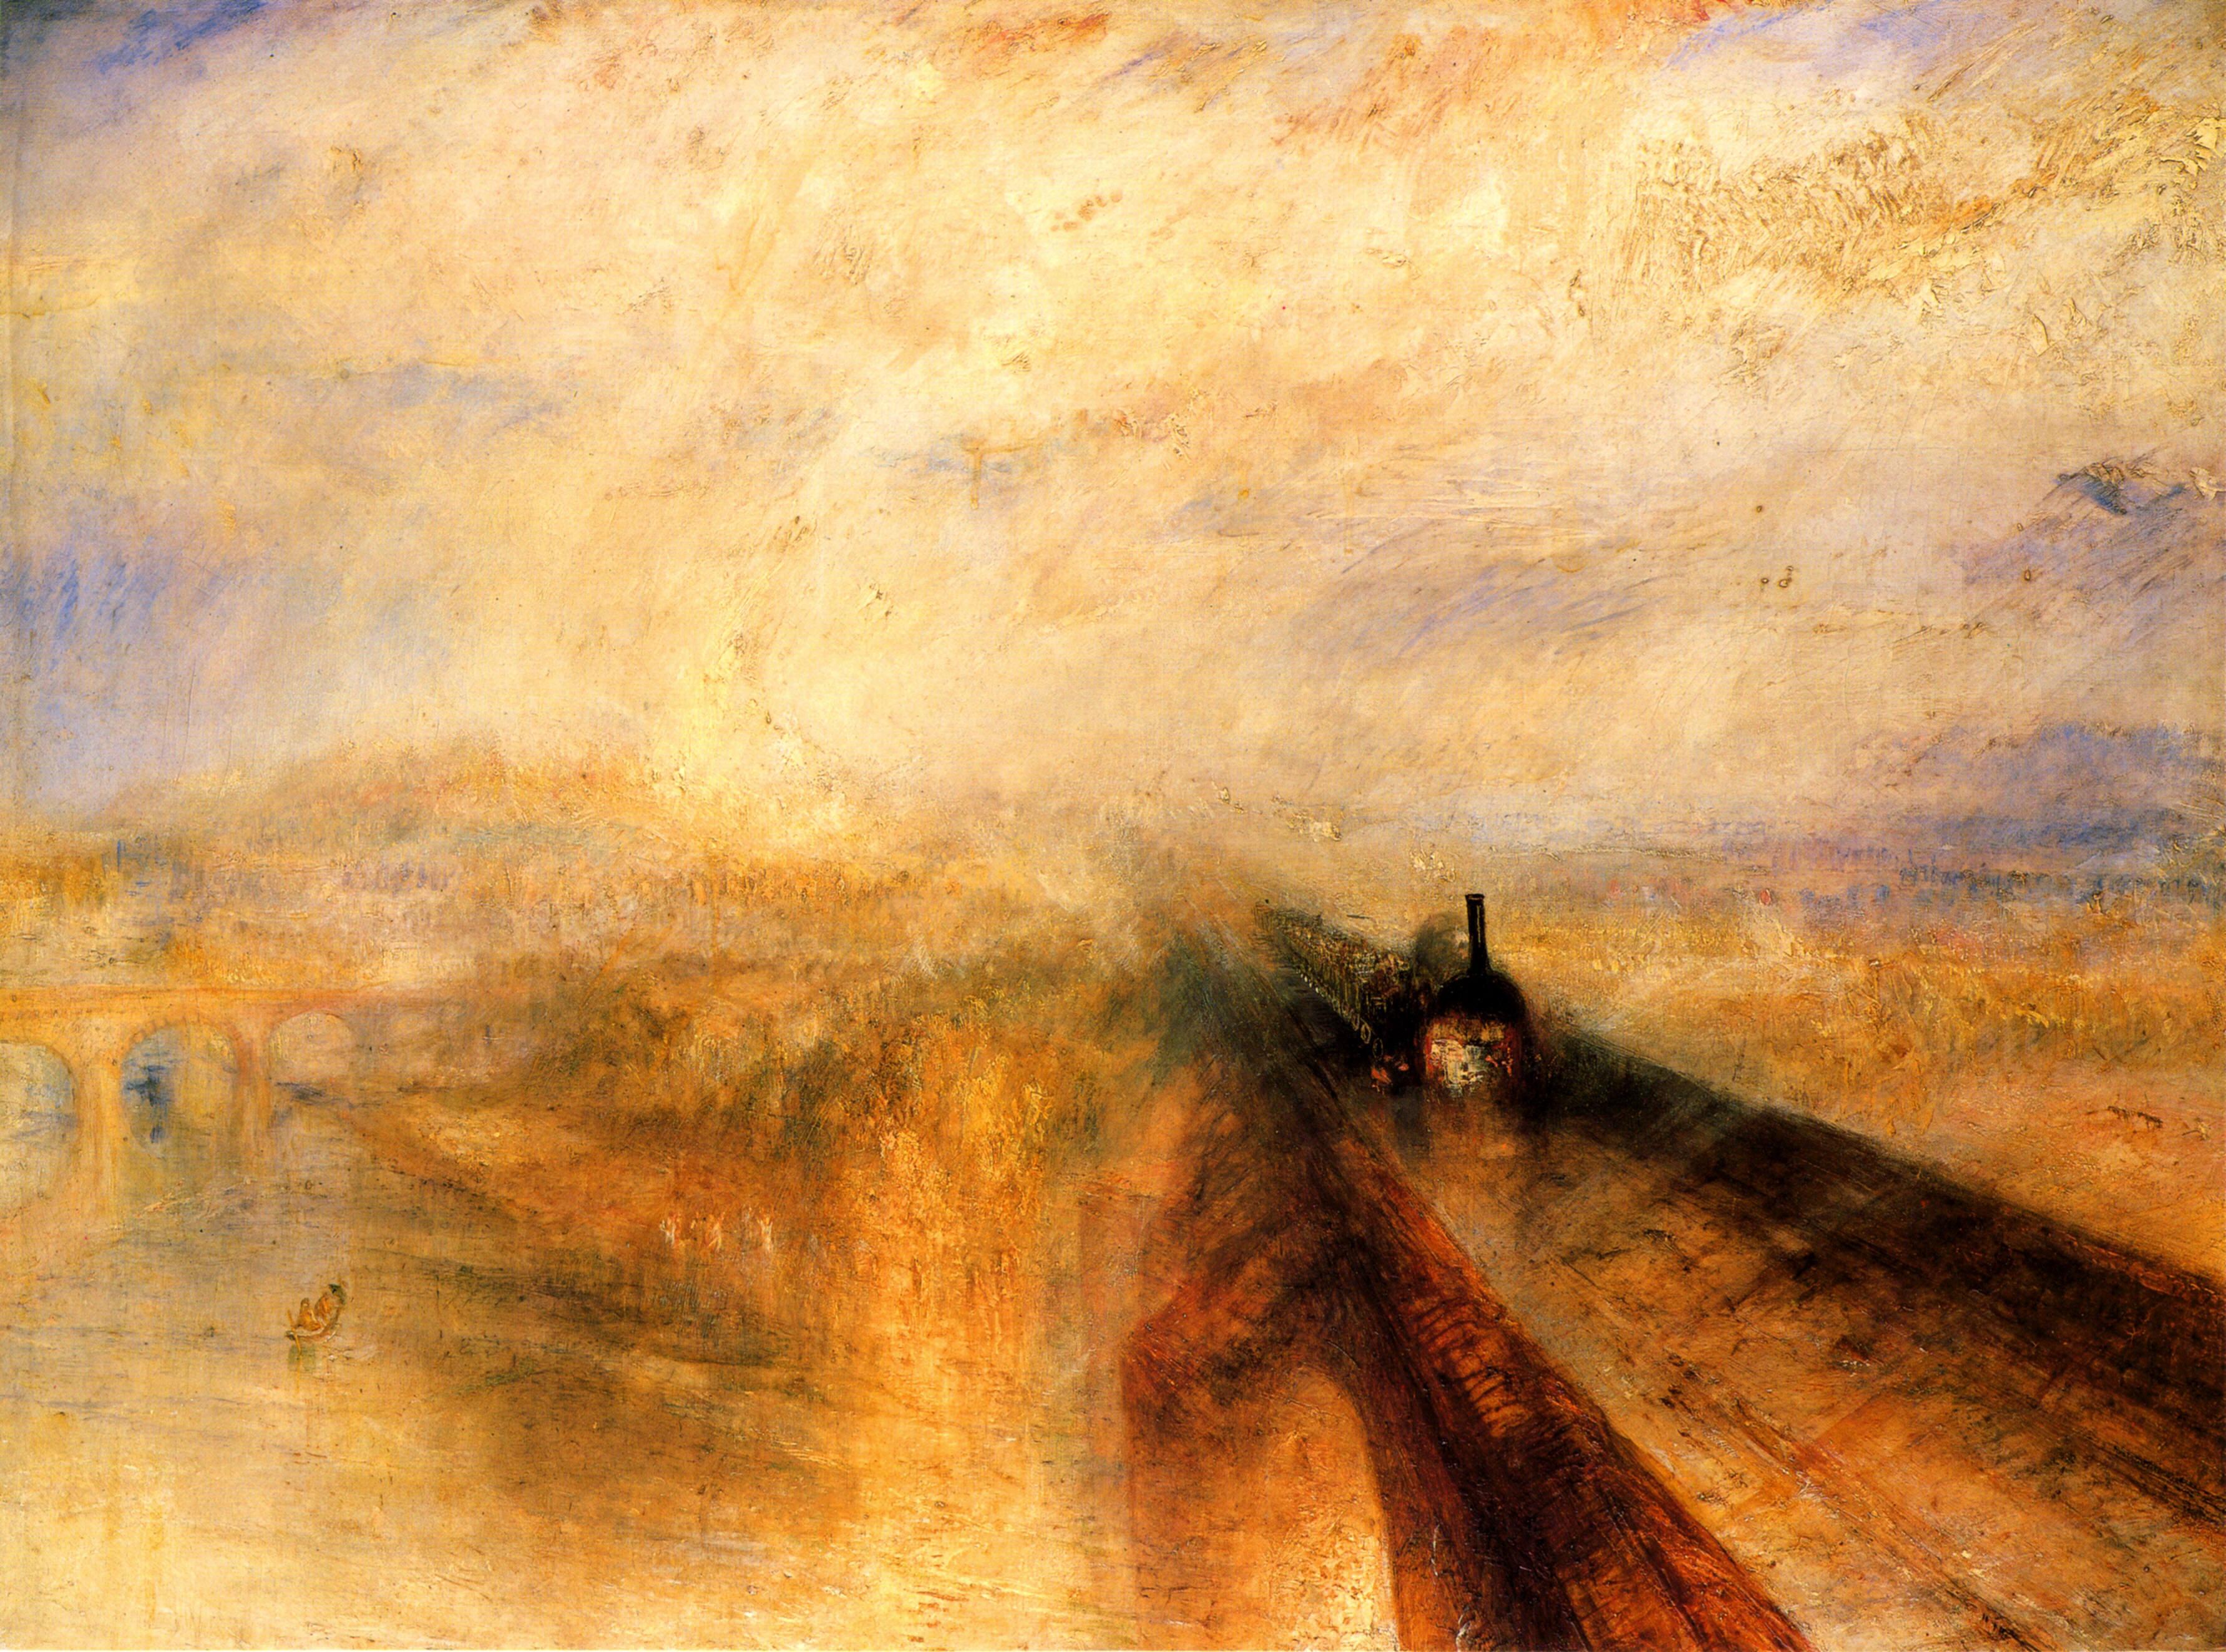 William Turner - Rain, steam and speed